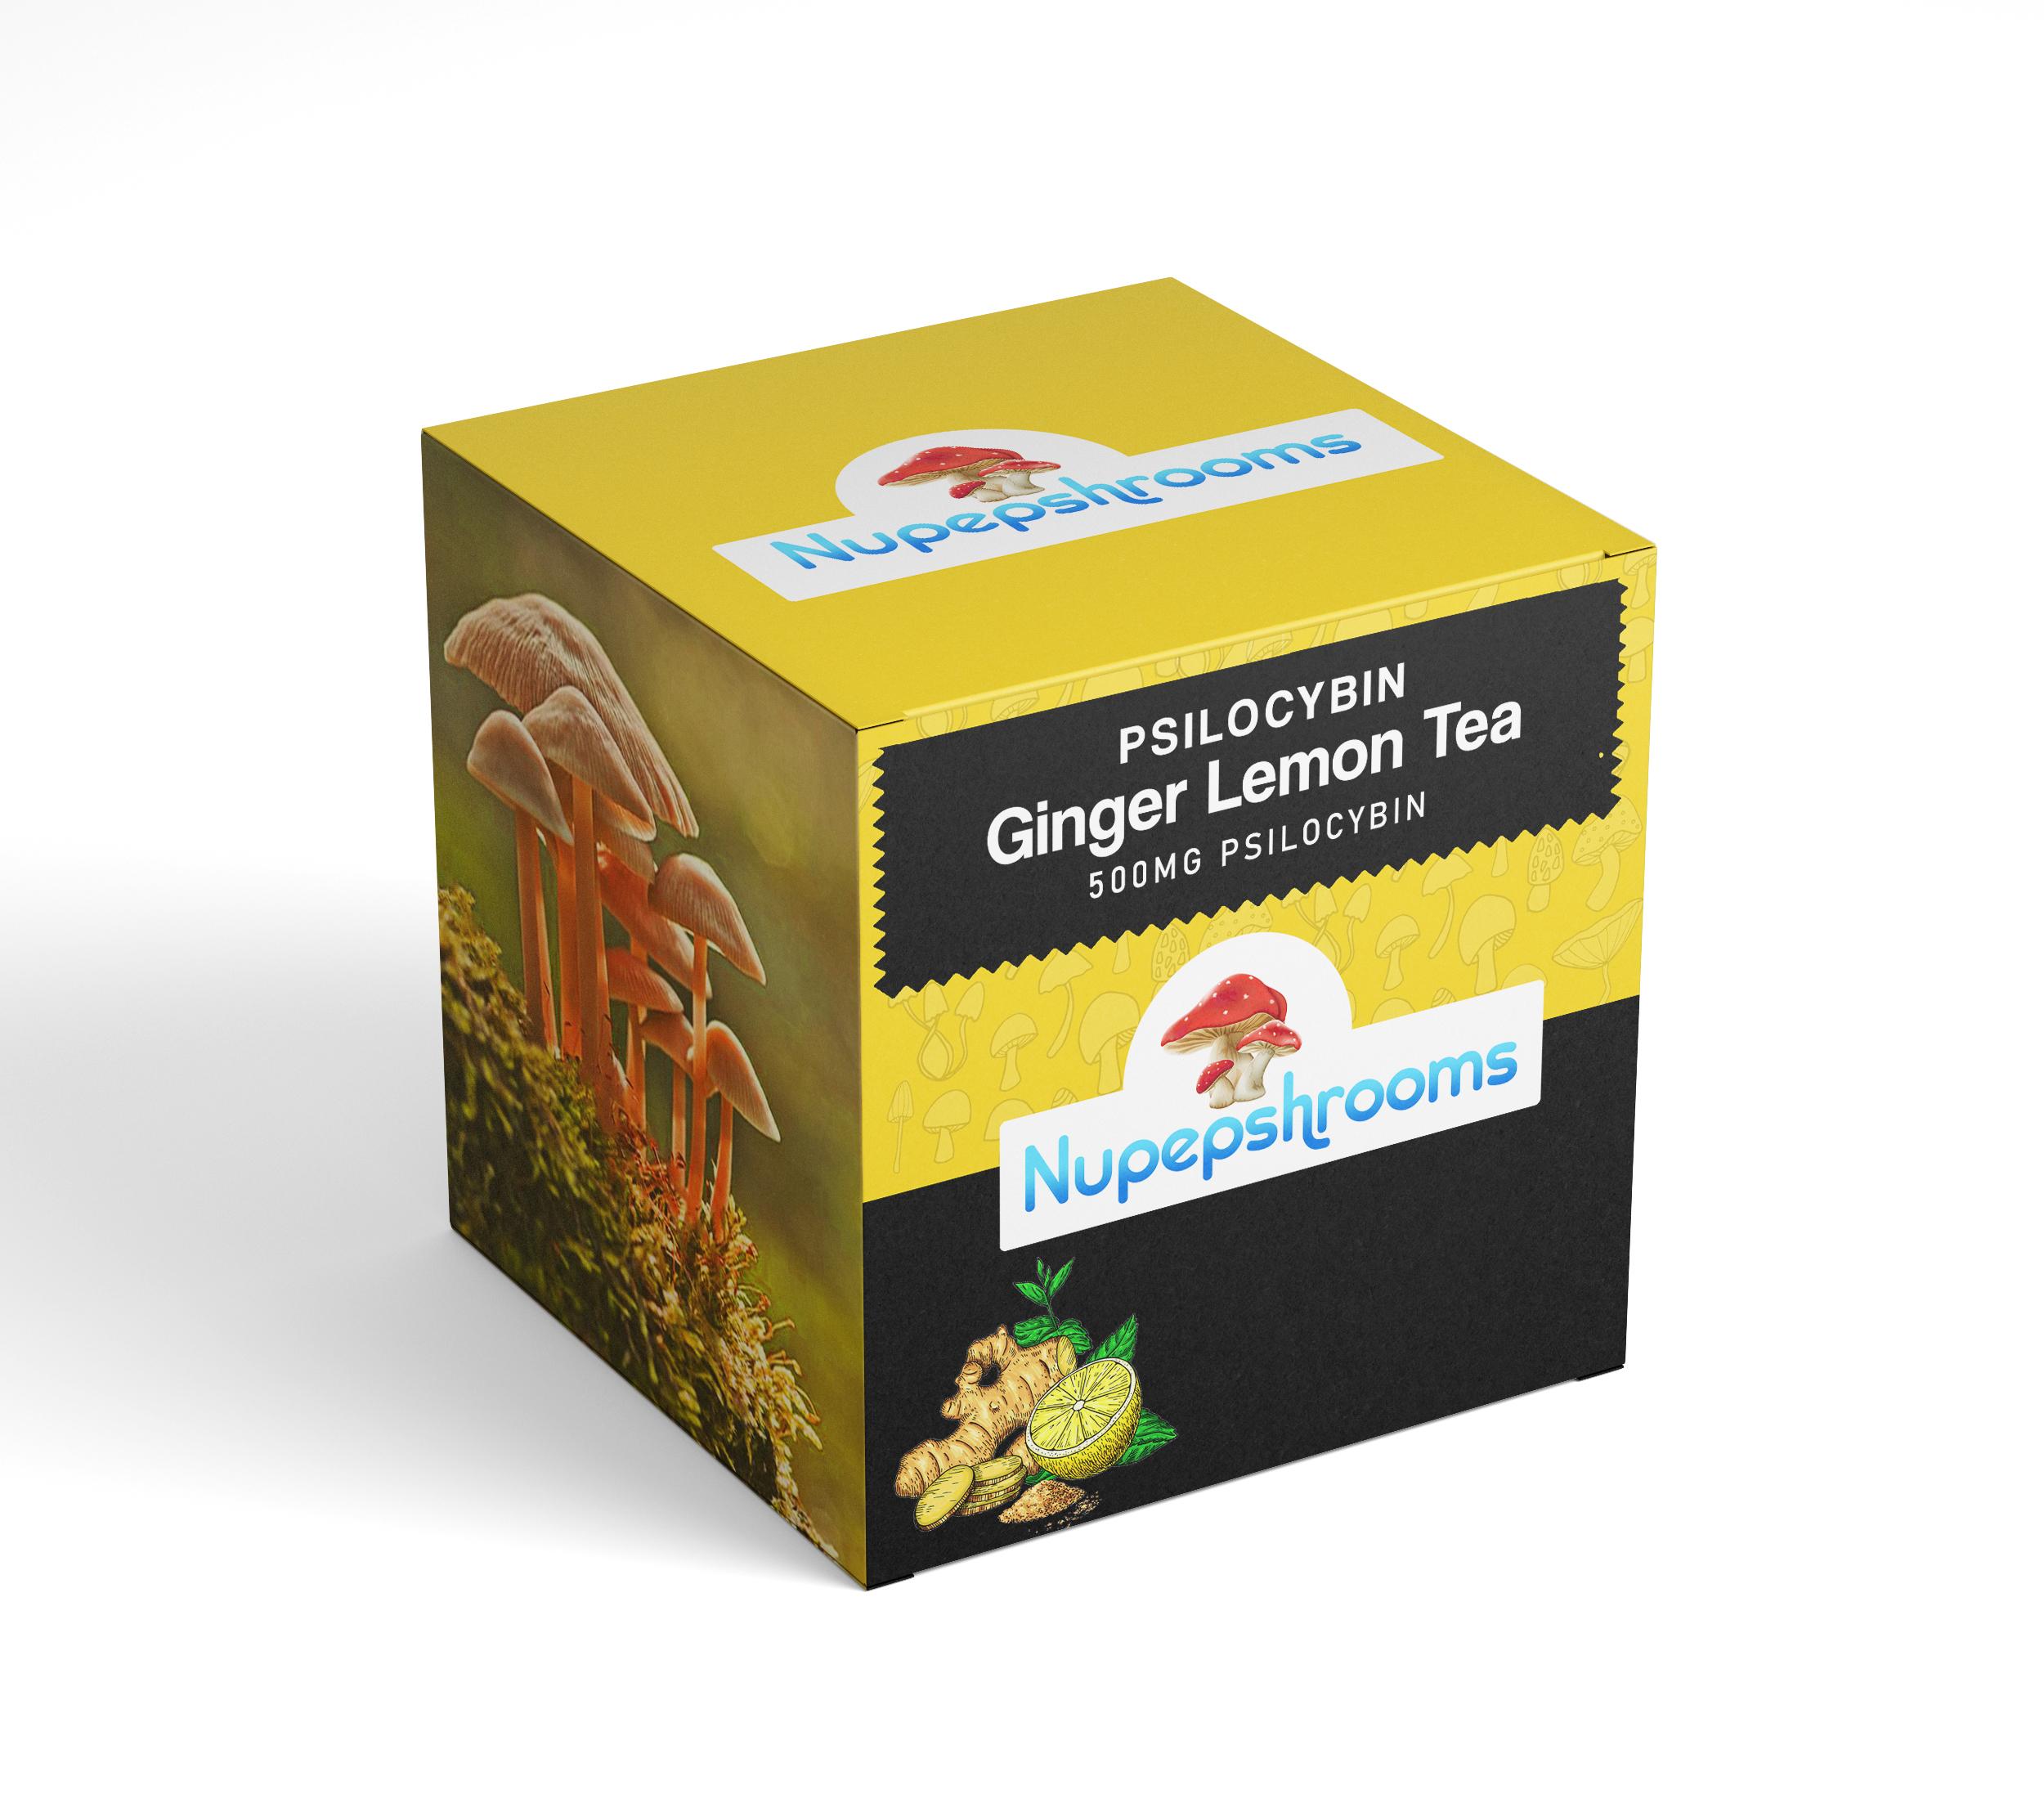 Psilocybin Ginger Lemon Tea